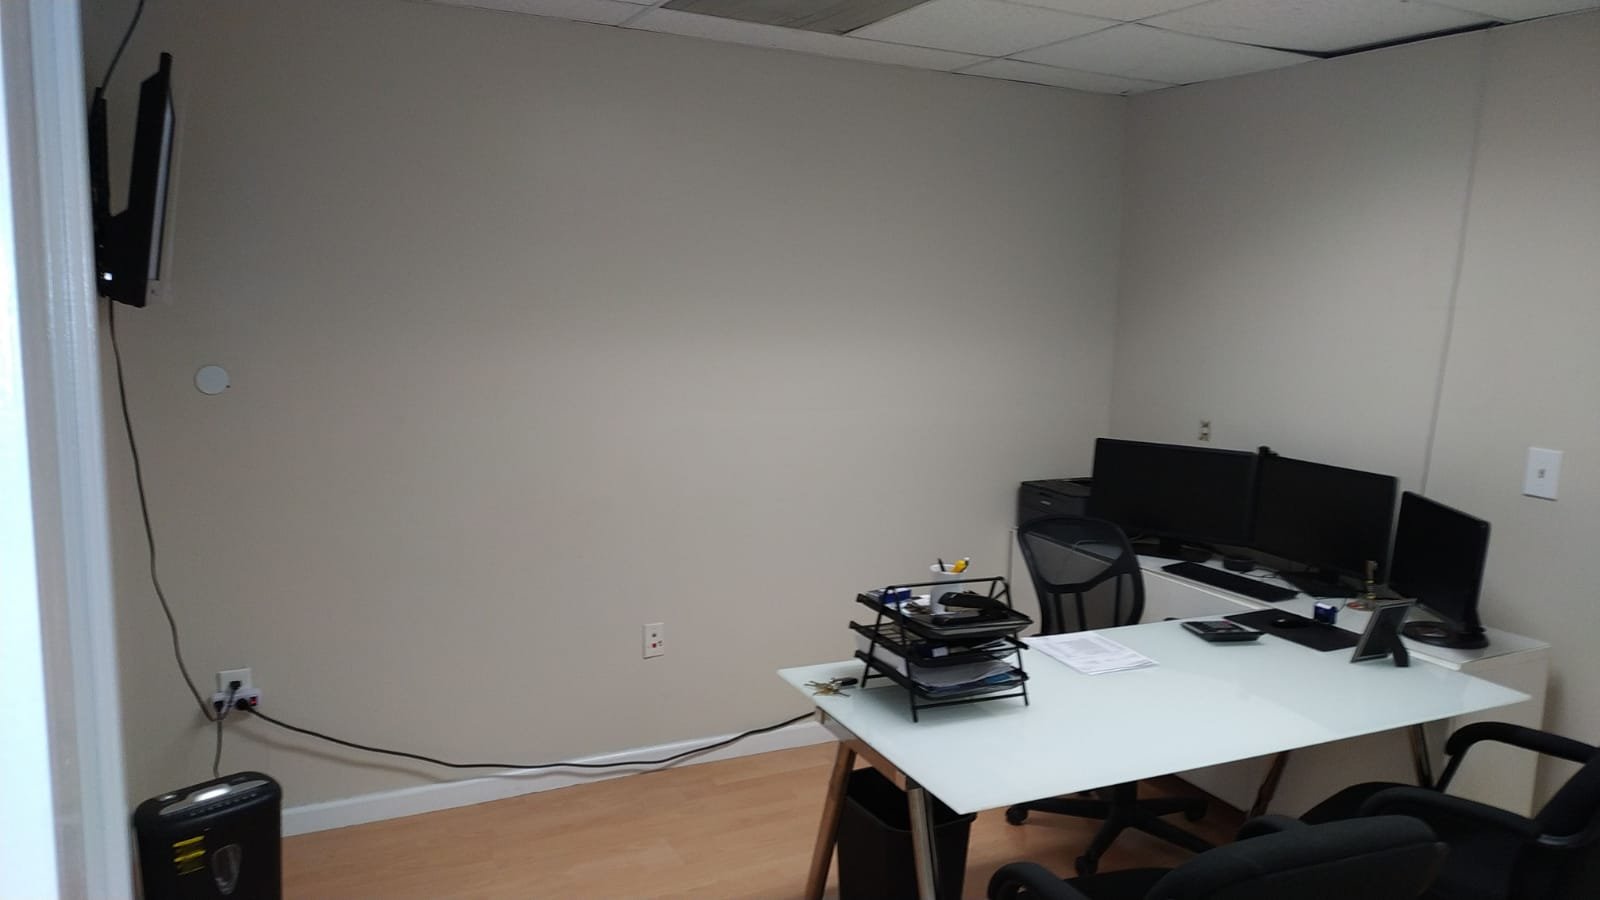 up-office-image-12.jpg